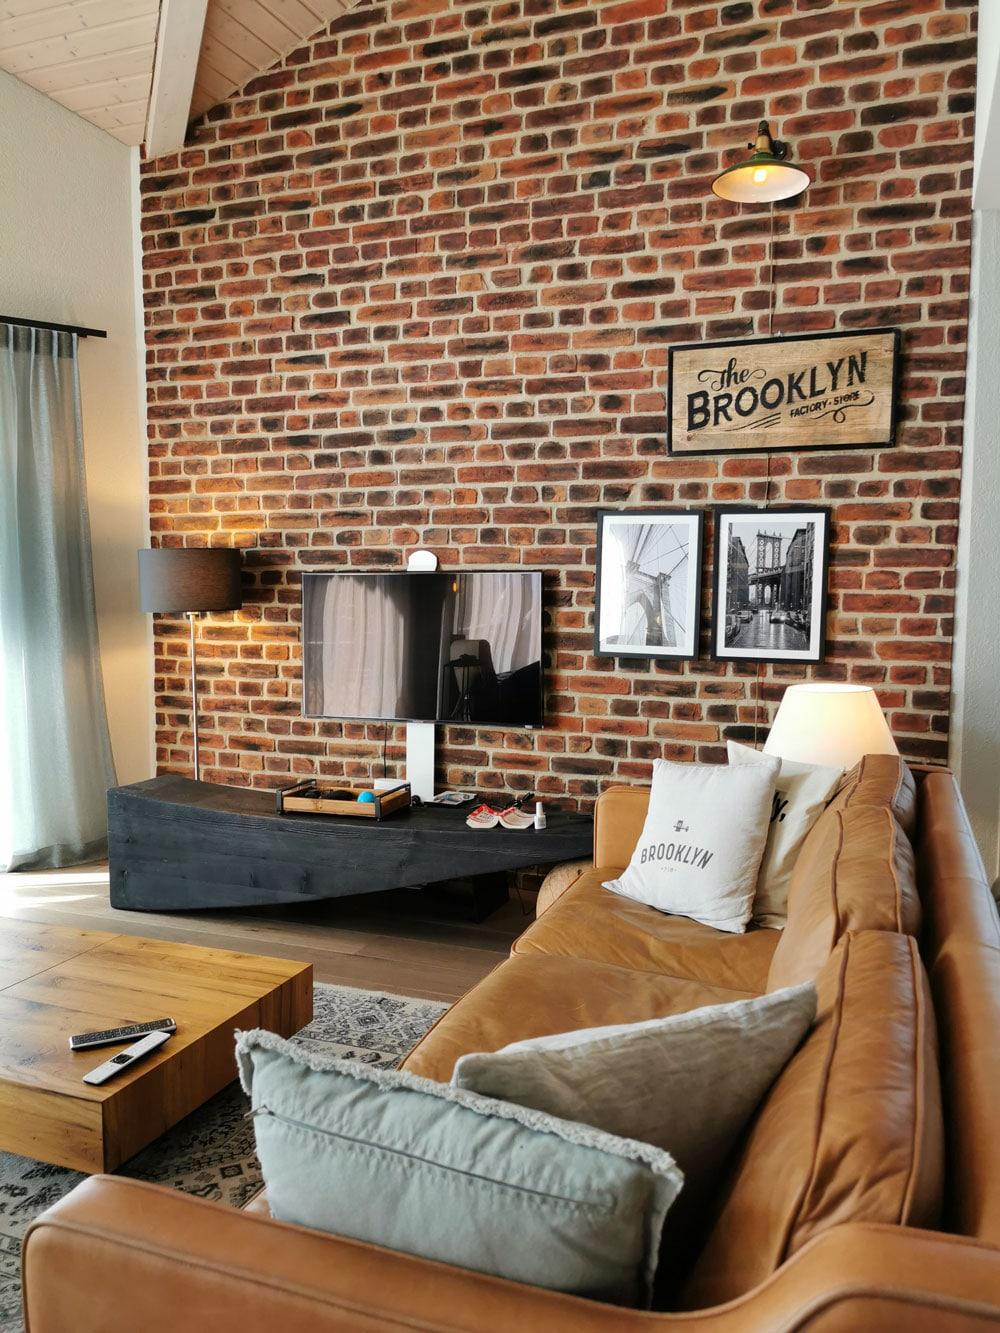 cdlp design interieur, interior designer, decoration interieur